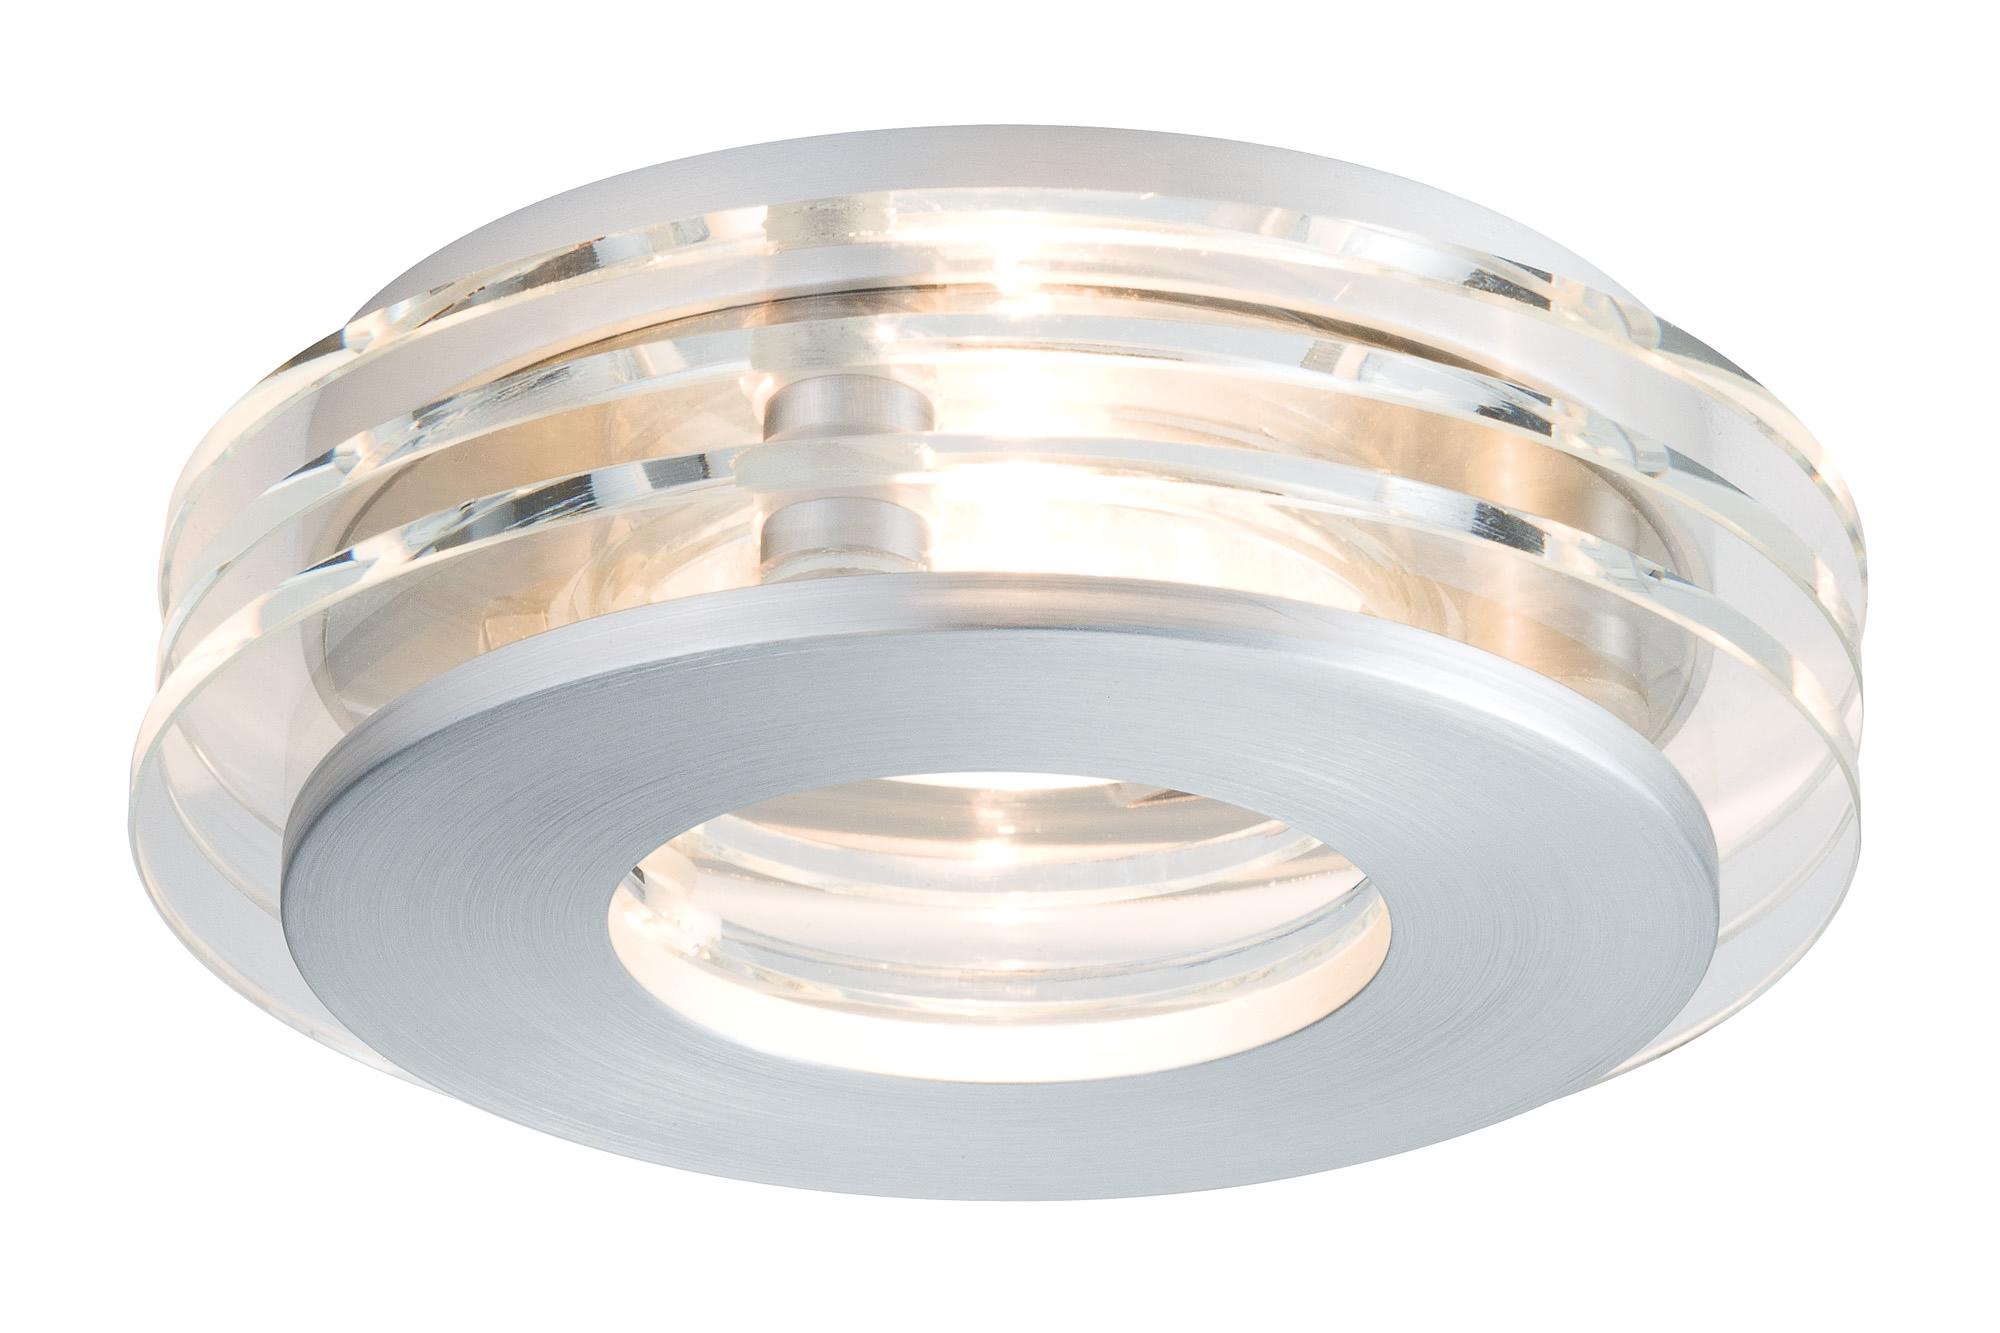 Paulmann. 92728 Premium EBL Shell LED 3x3,5W GU10 Al-g